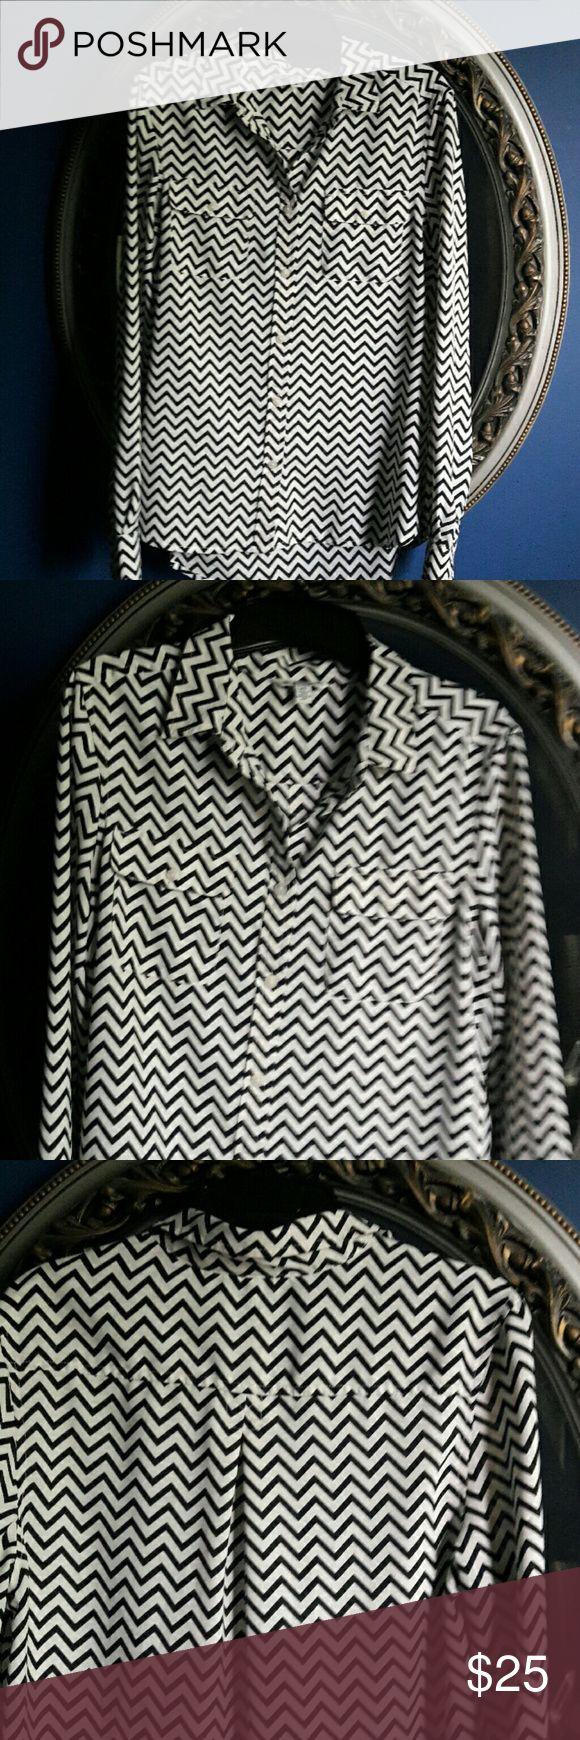 Chevron shirt Black and white chevron long sleeve button down shirt. American Eagle Outfitters Tops Button Down Shirts